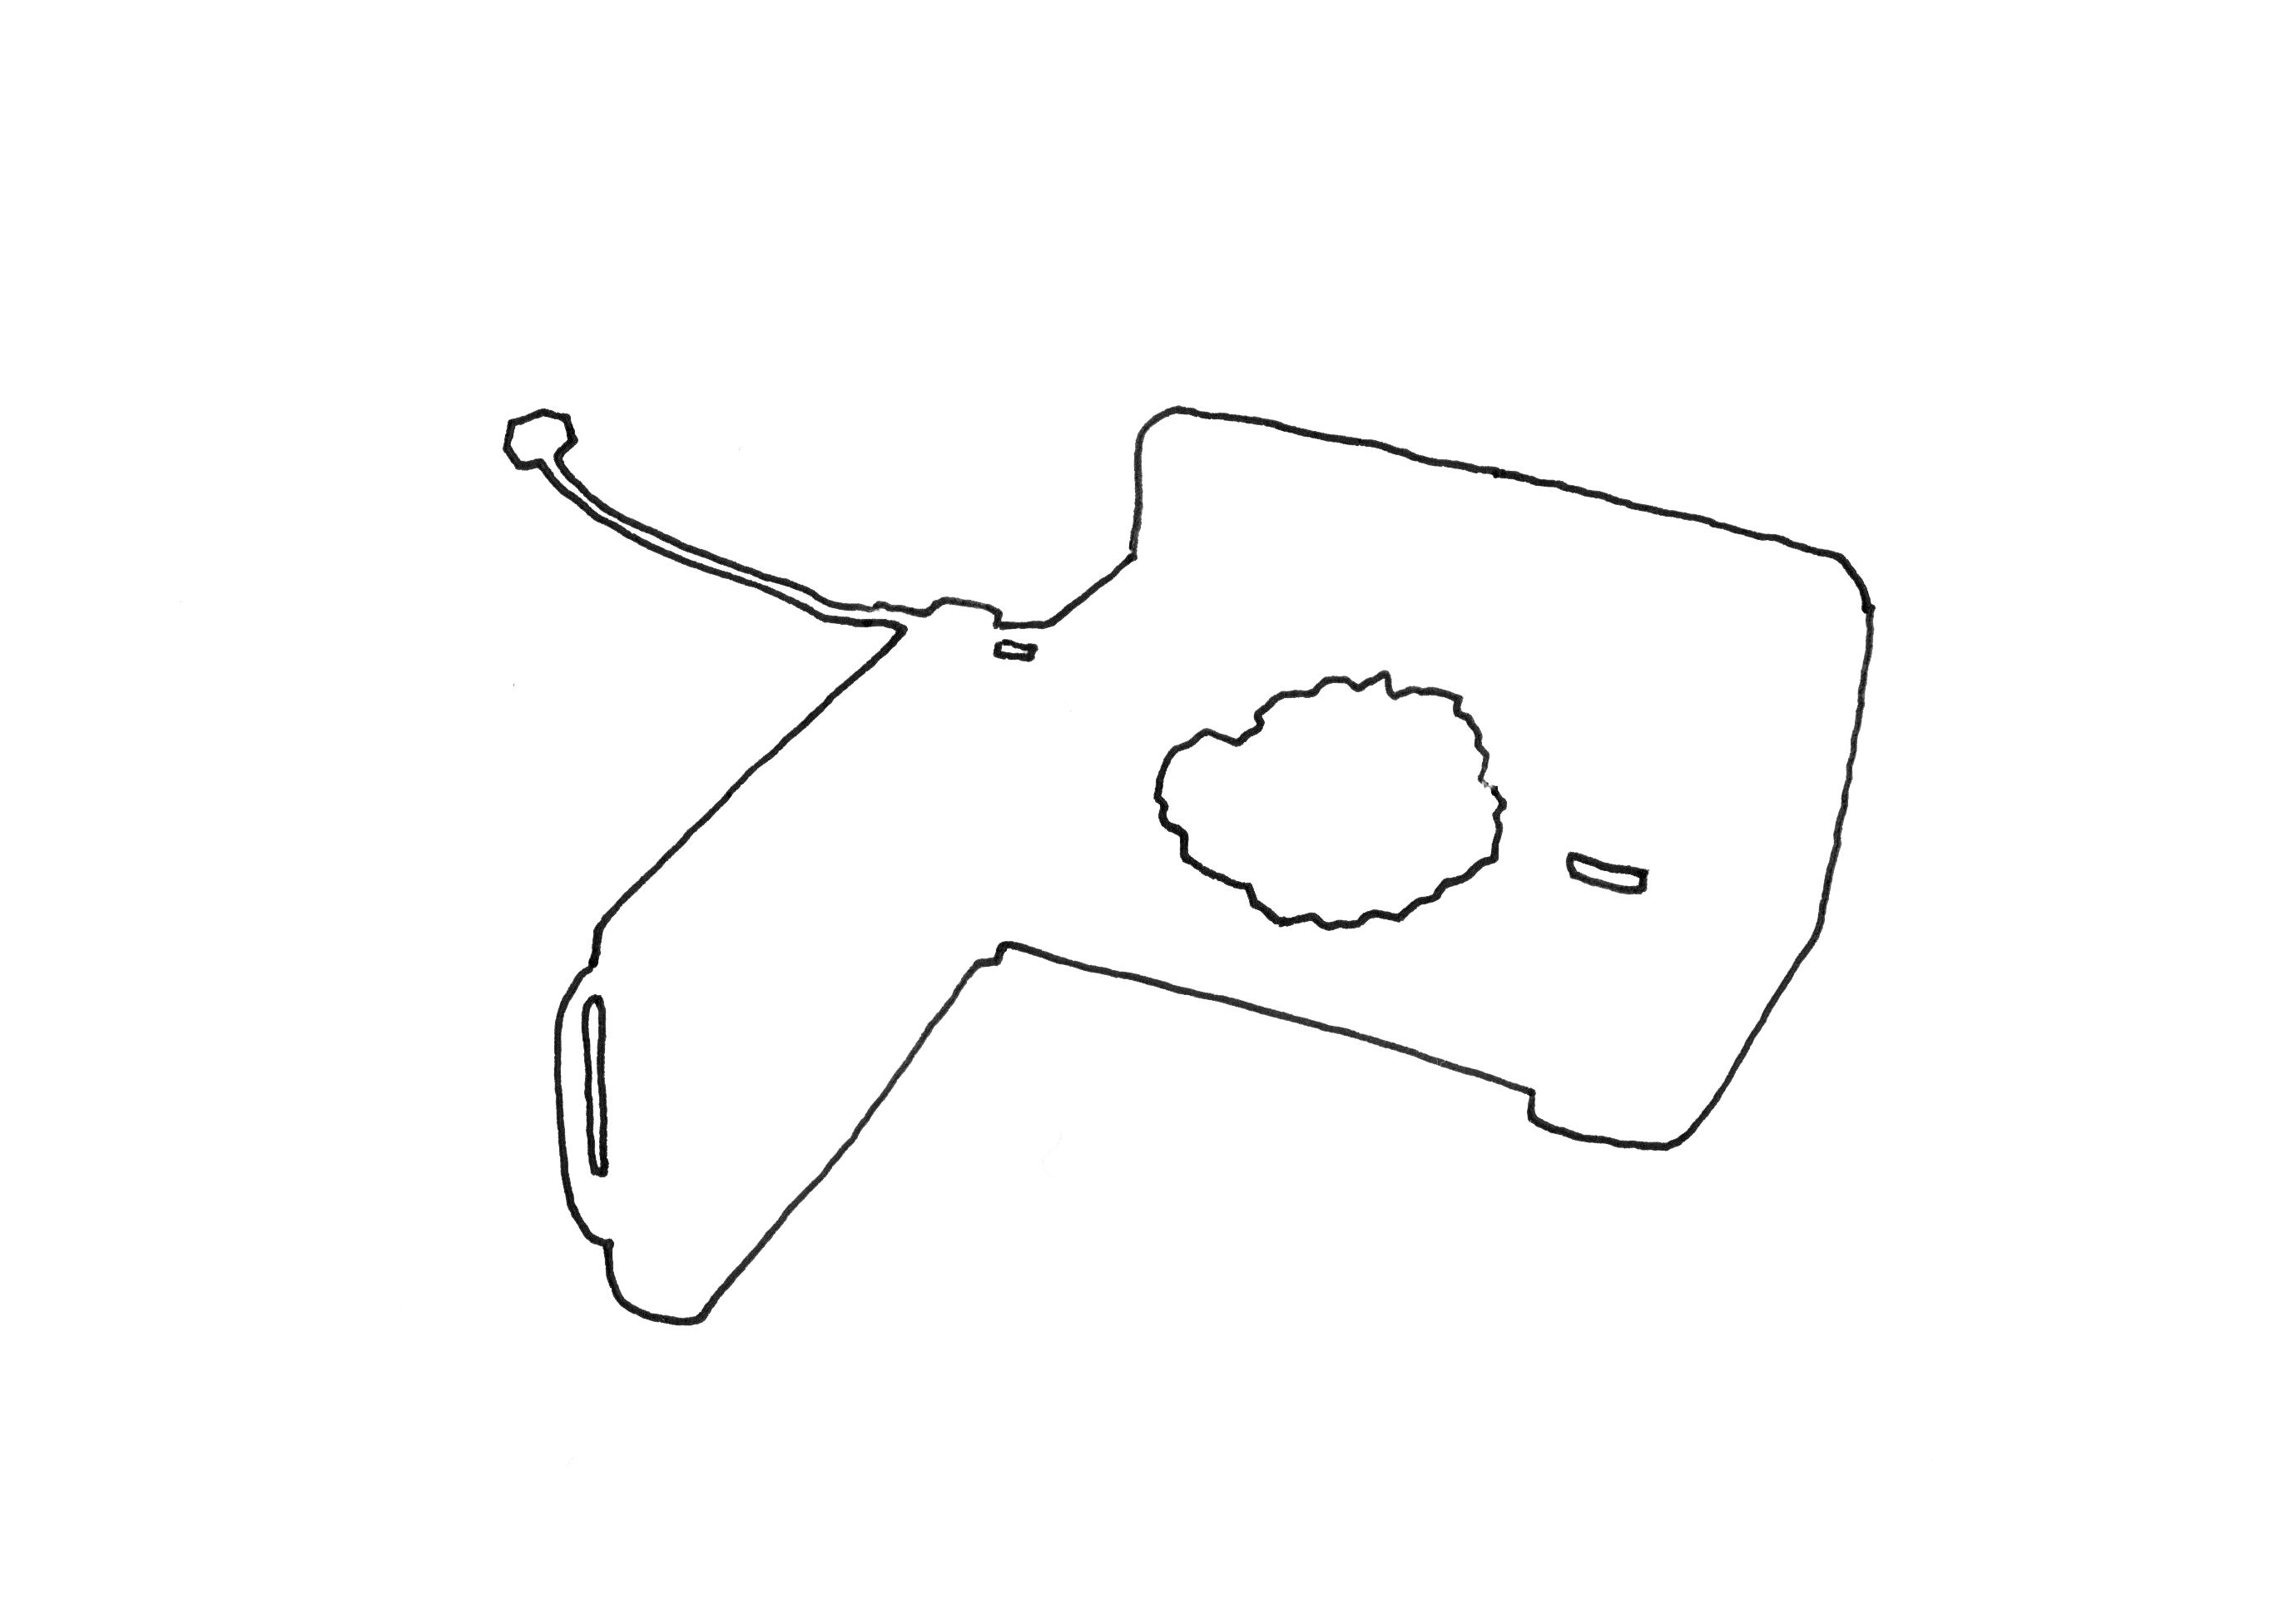 Demi-meteorite en milieu naturel